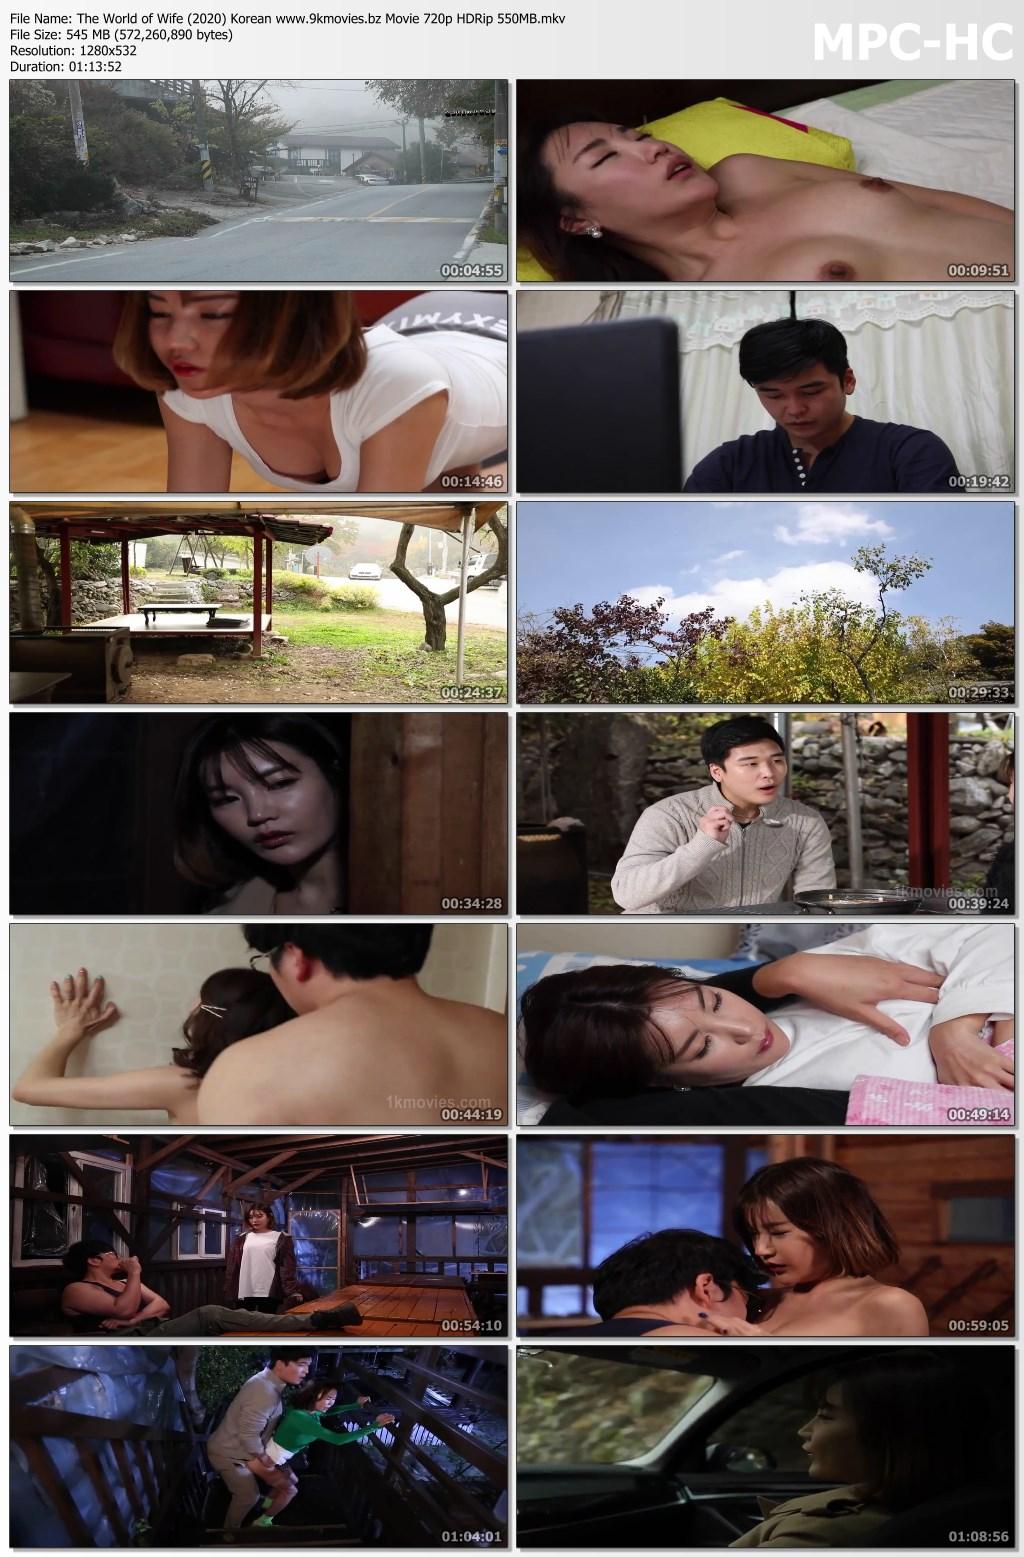 The World of Wife (2020) Korean www.9kmovies.bz Movie 720p HDRip 550MB.mkv thumbs